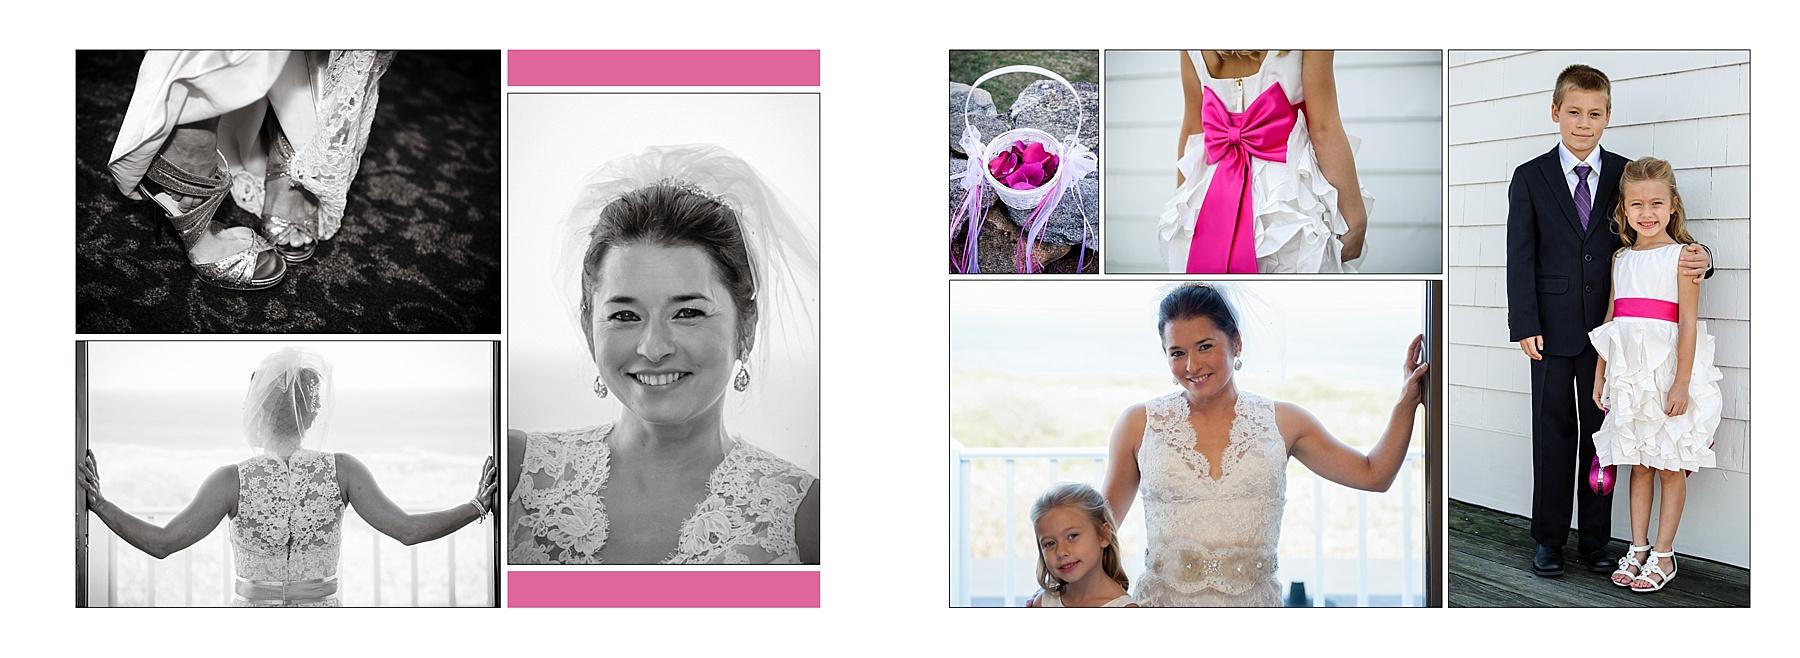 spread04_Wedding Album_Block Island RI WEB.jpg